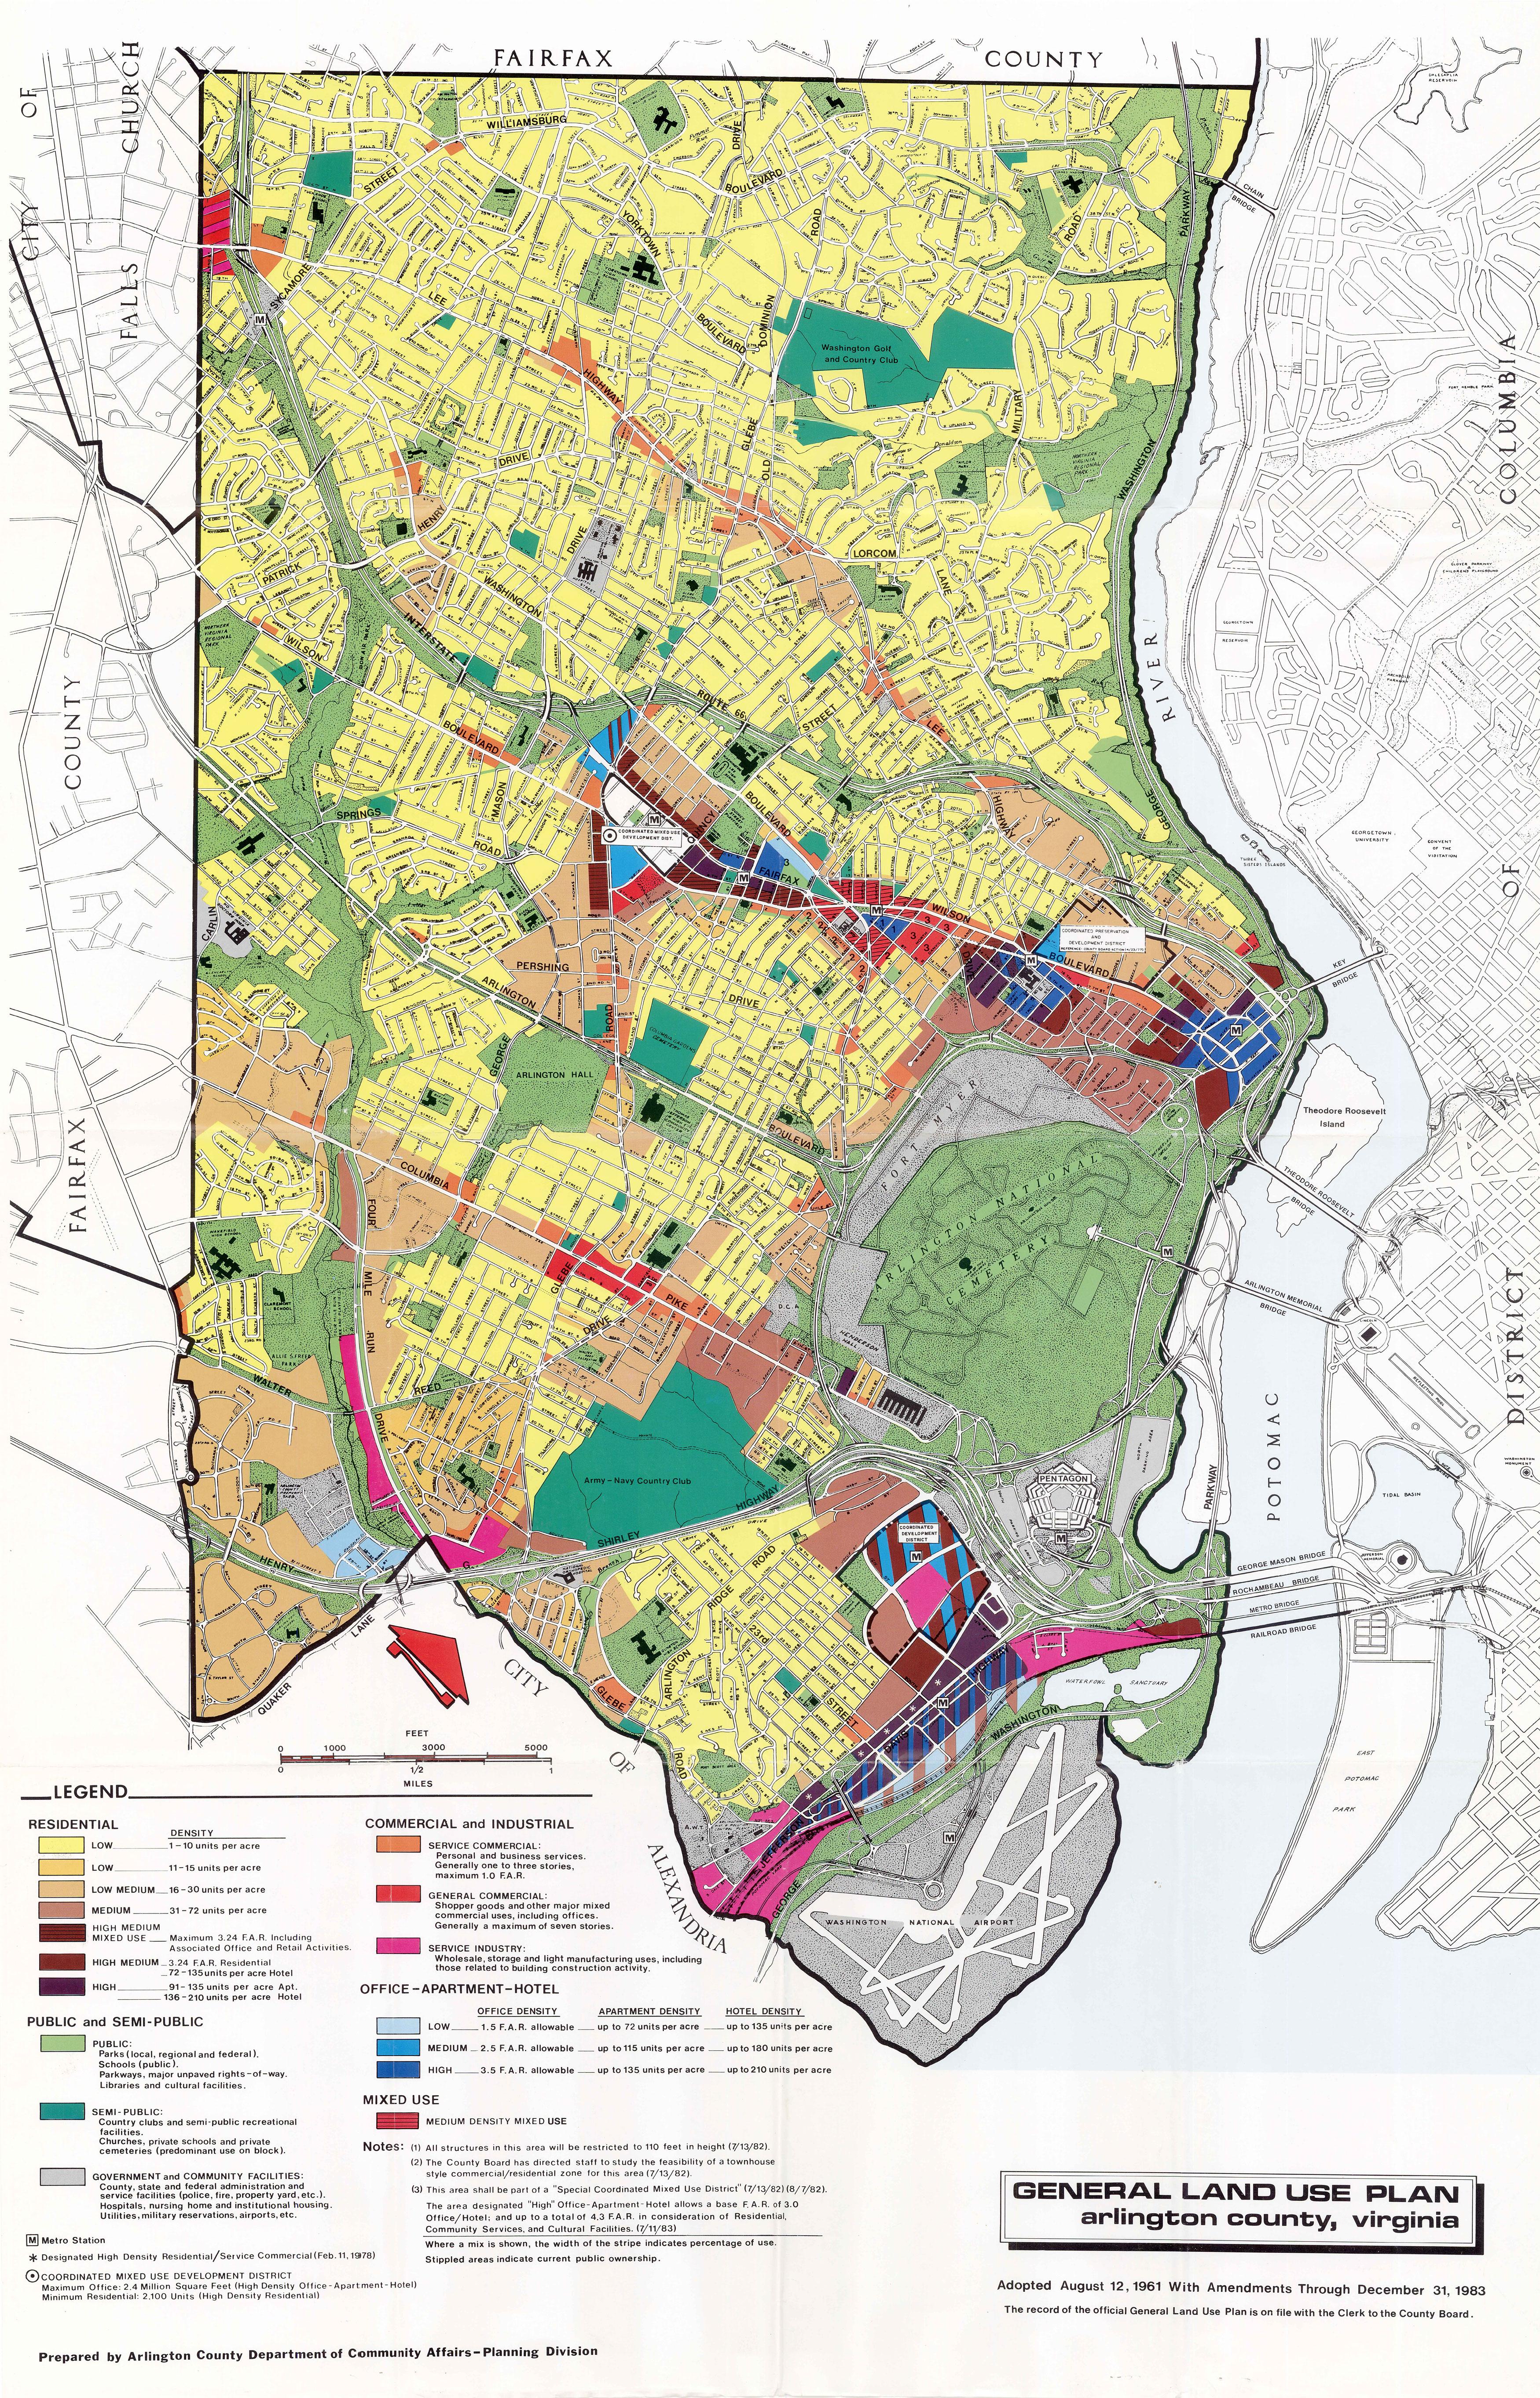 Historical General Land Use Plan Maps